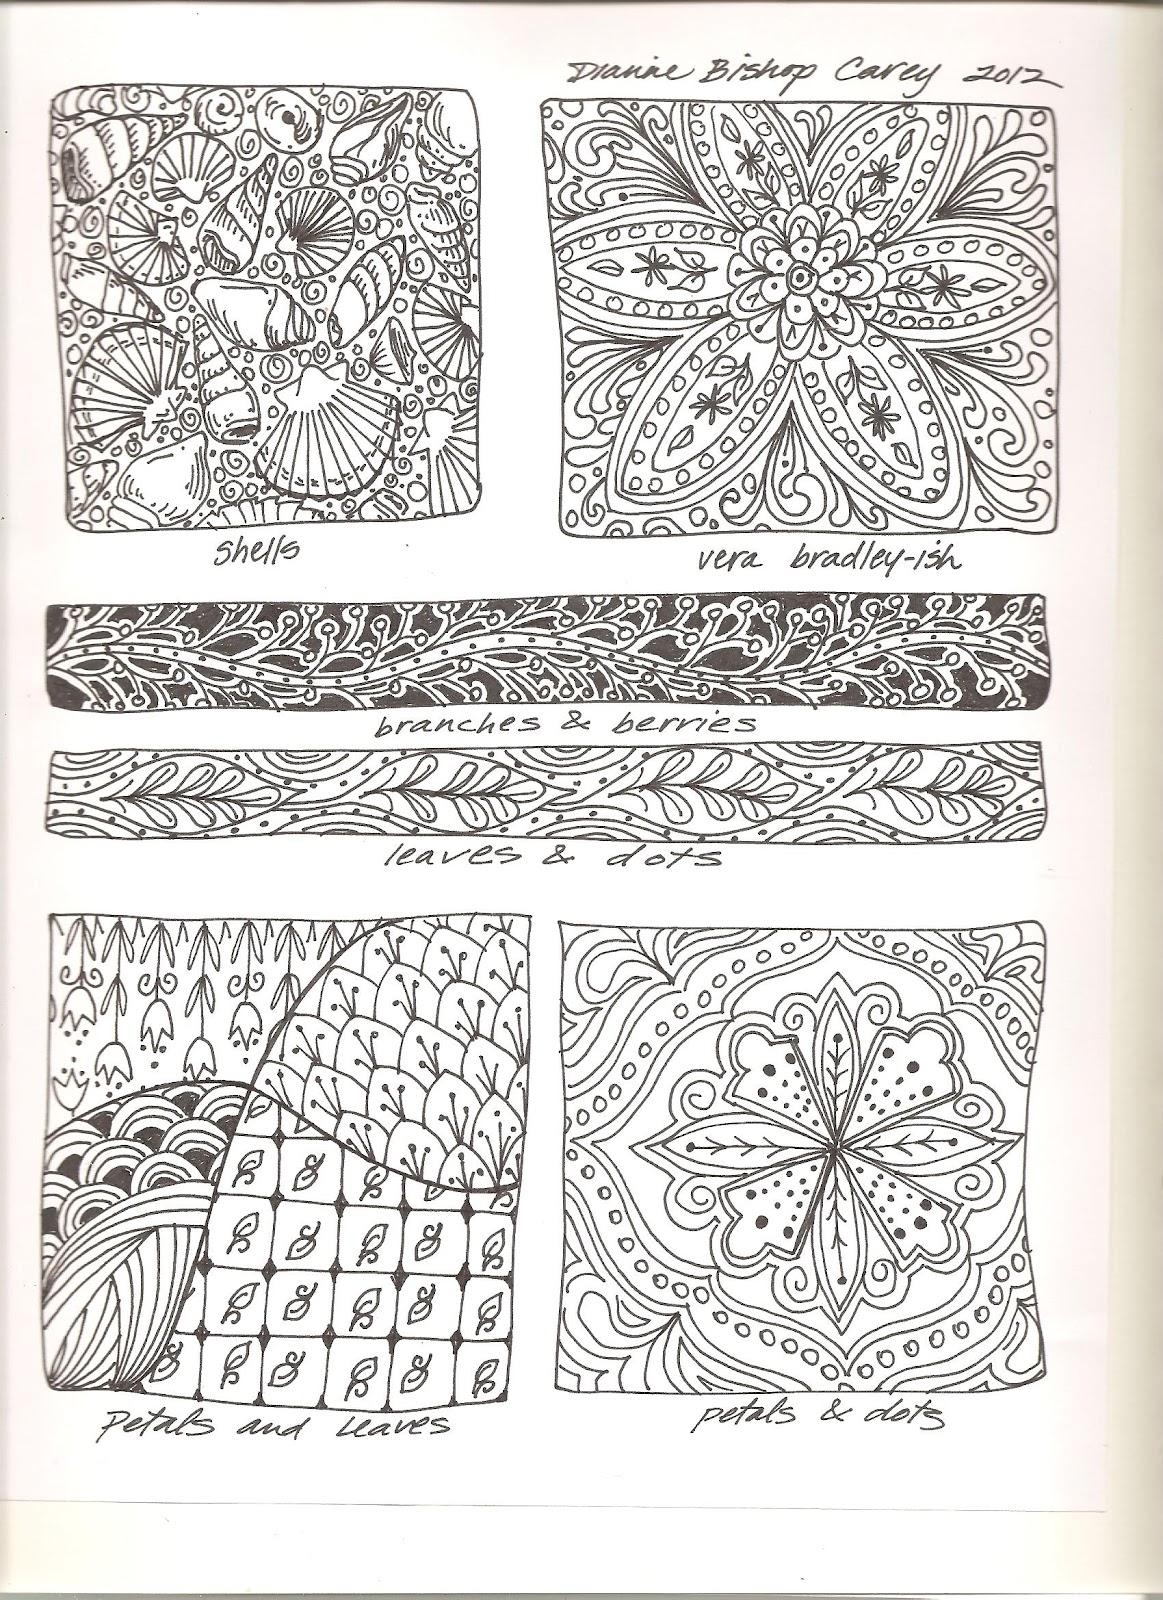 http://3.bp.blogspot.com/-mue5rkrADzk/T9ifmJmFDUI/AAAAAAAABpg/UTLkEWYFVbU/s1600/doodle+patterns+3+001.jpg